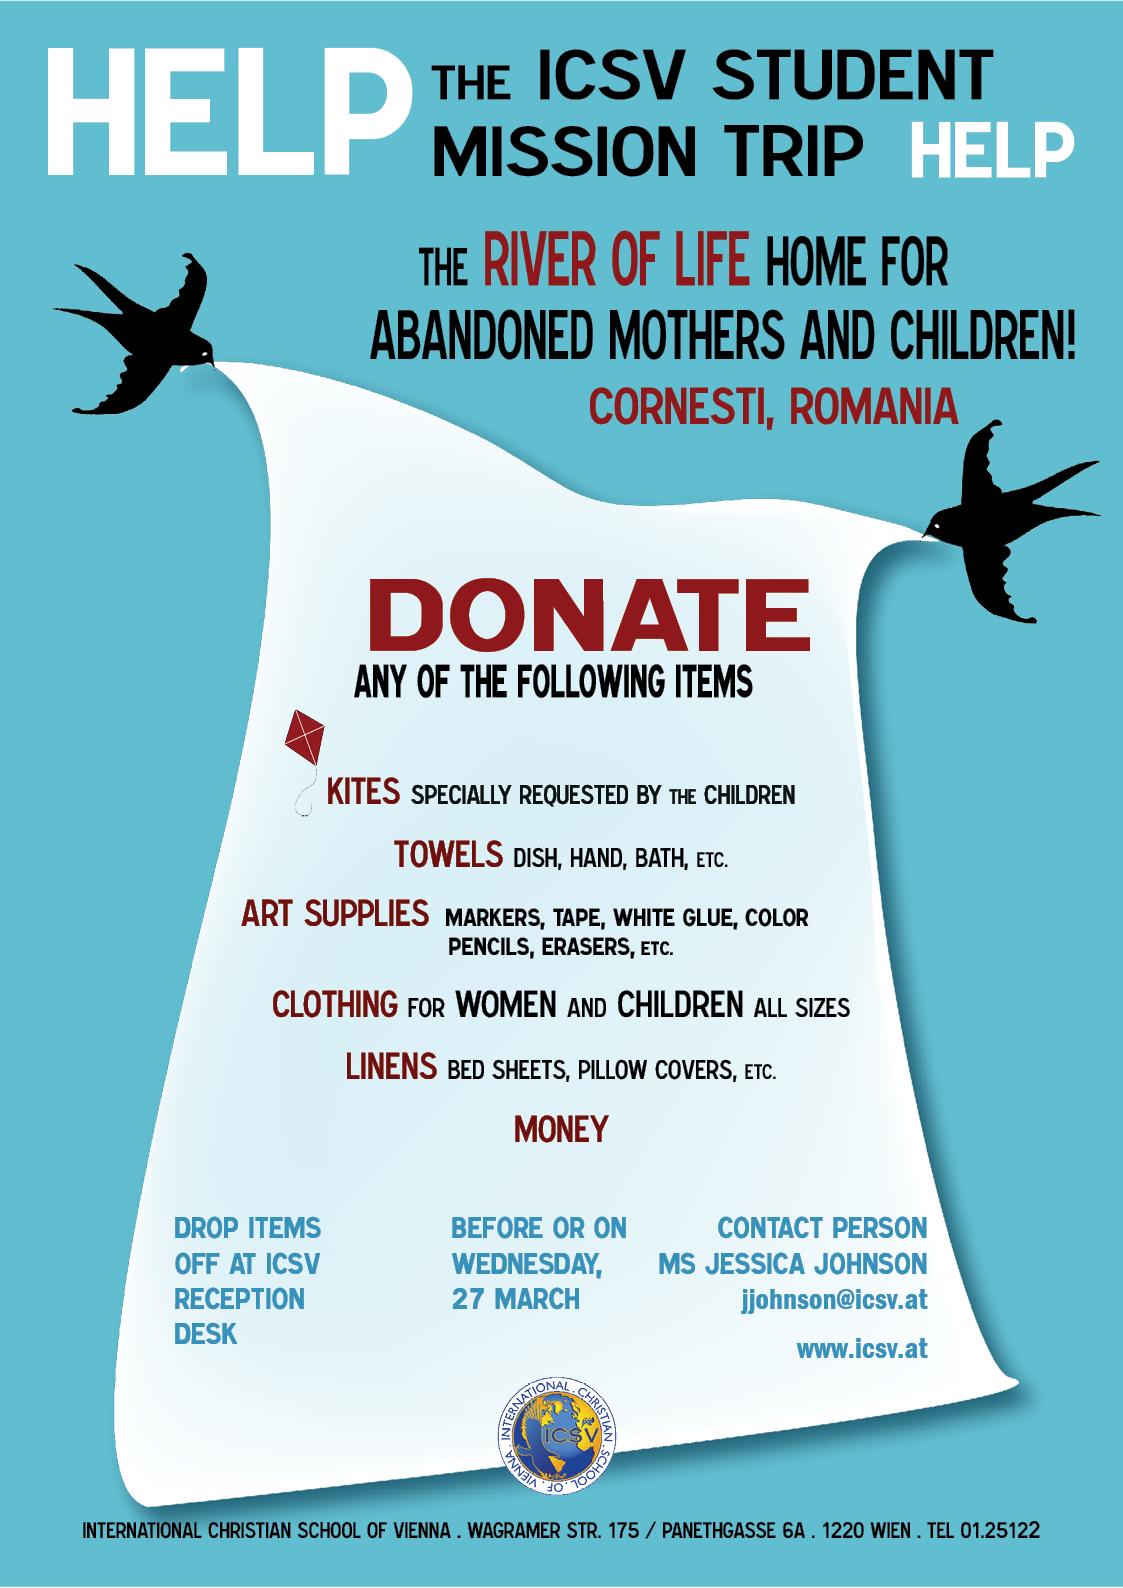 Icsv Romanian Mission Trip Donation Poster 2013 Dax Graphics